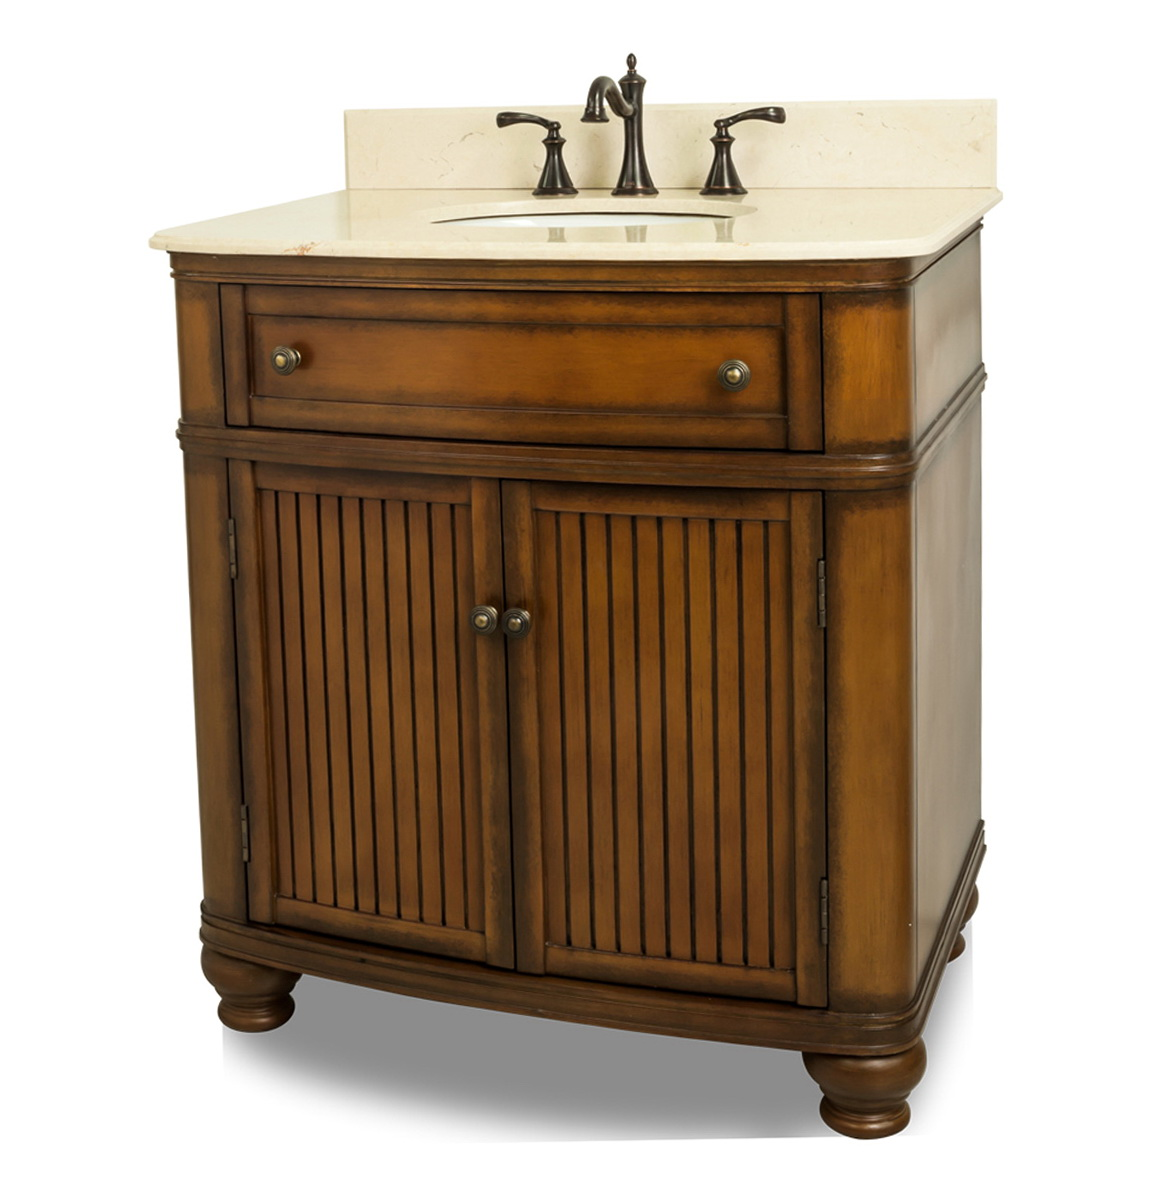 32 Inch Bathroom Vanity Cabinet